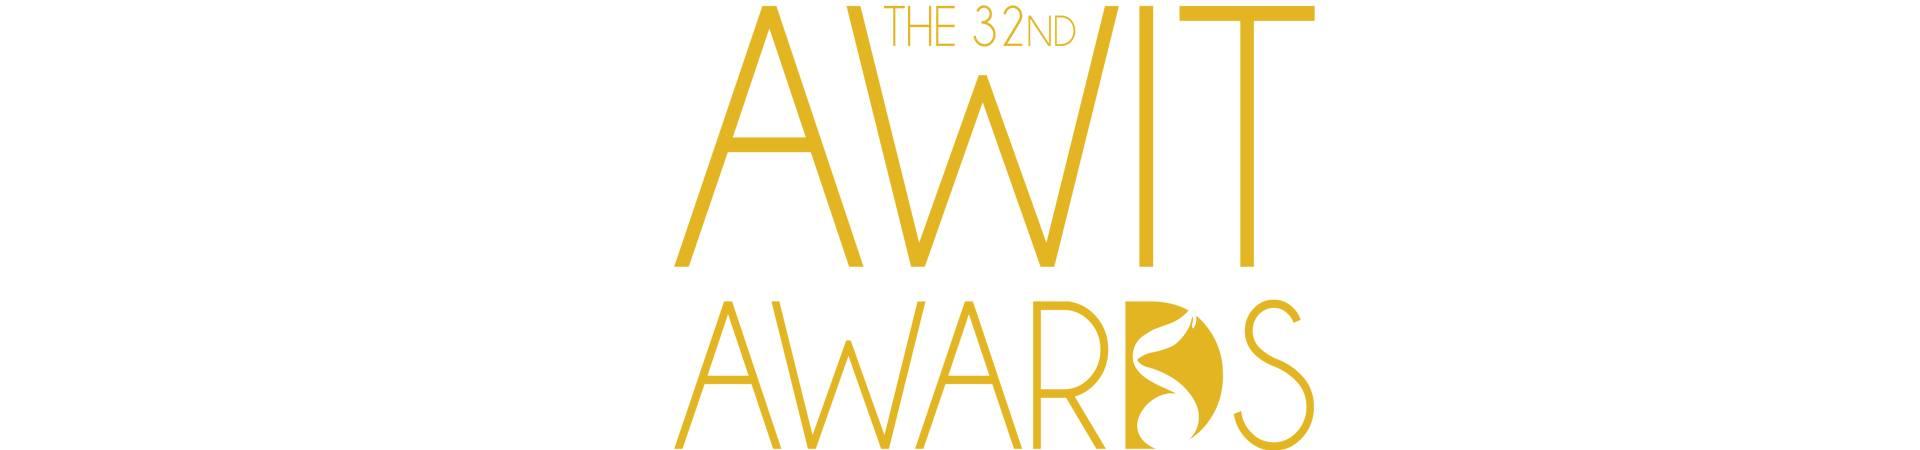 32nd Awit Awards Favorite Male Artist